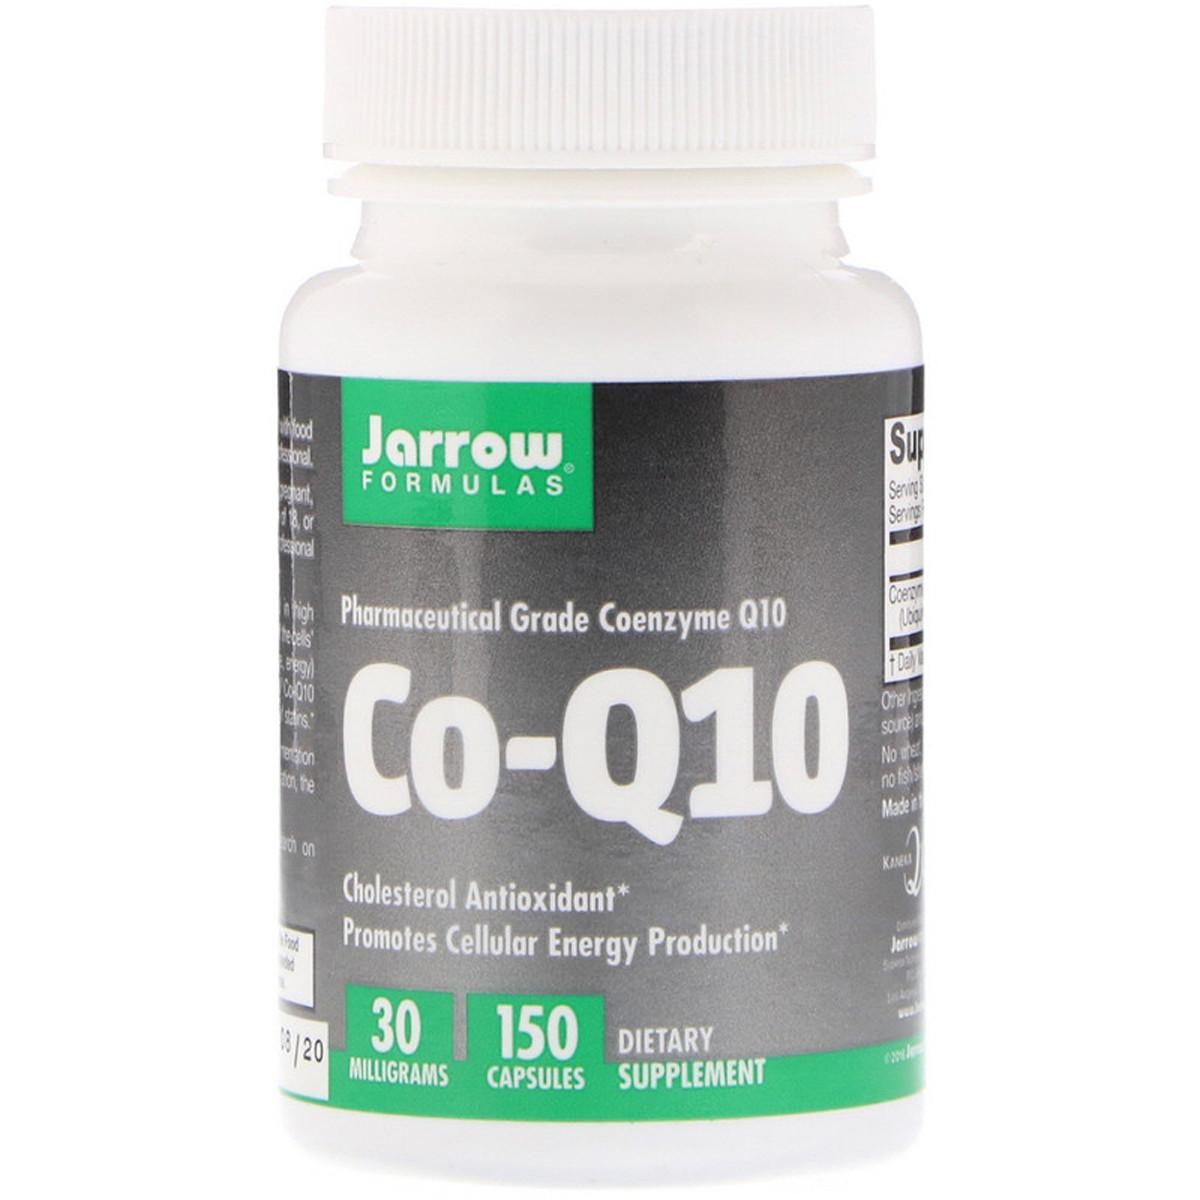 Коэнзим Q10, 30 мг, Co-Q10, Jarrow Formulas, 150 капсул,  джарроу формула